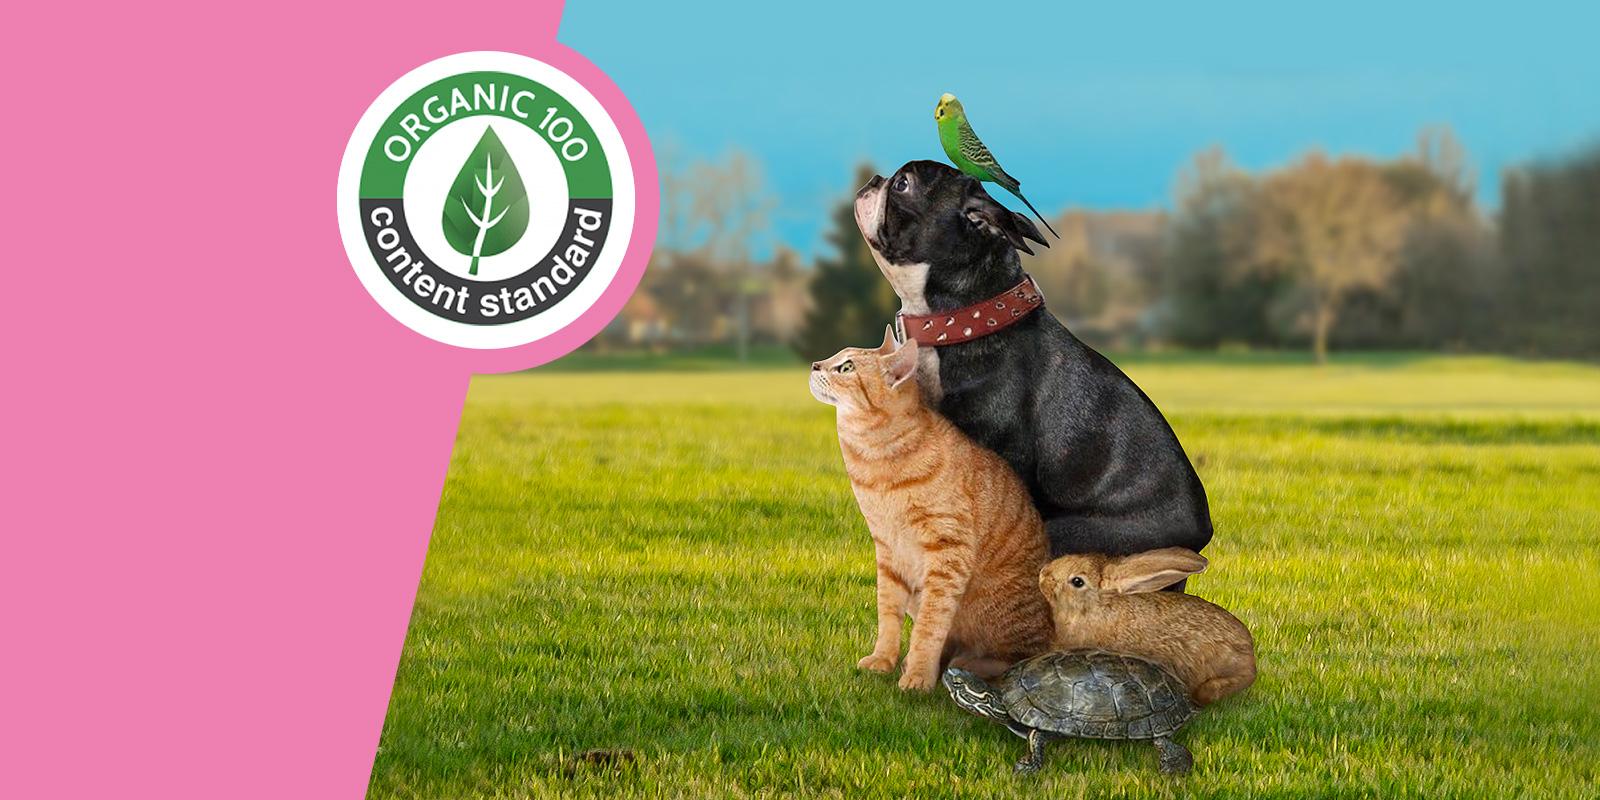 Organic-Content-Vegan Society shop abbigliamento e cosmesi